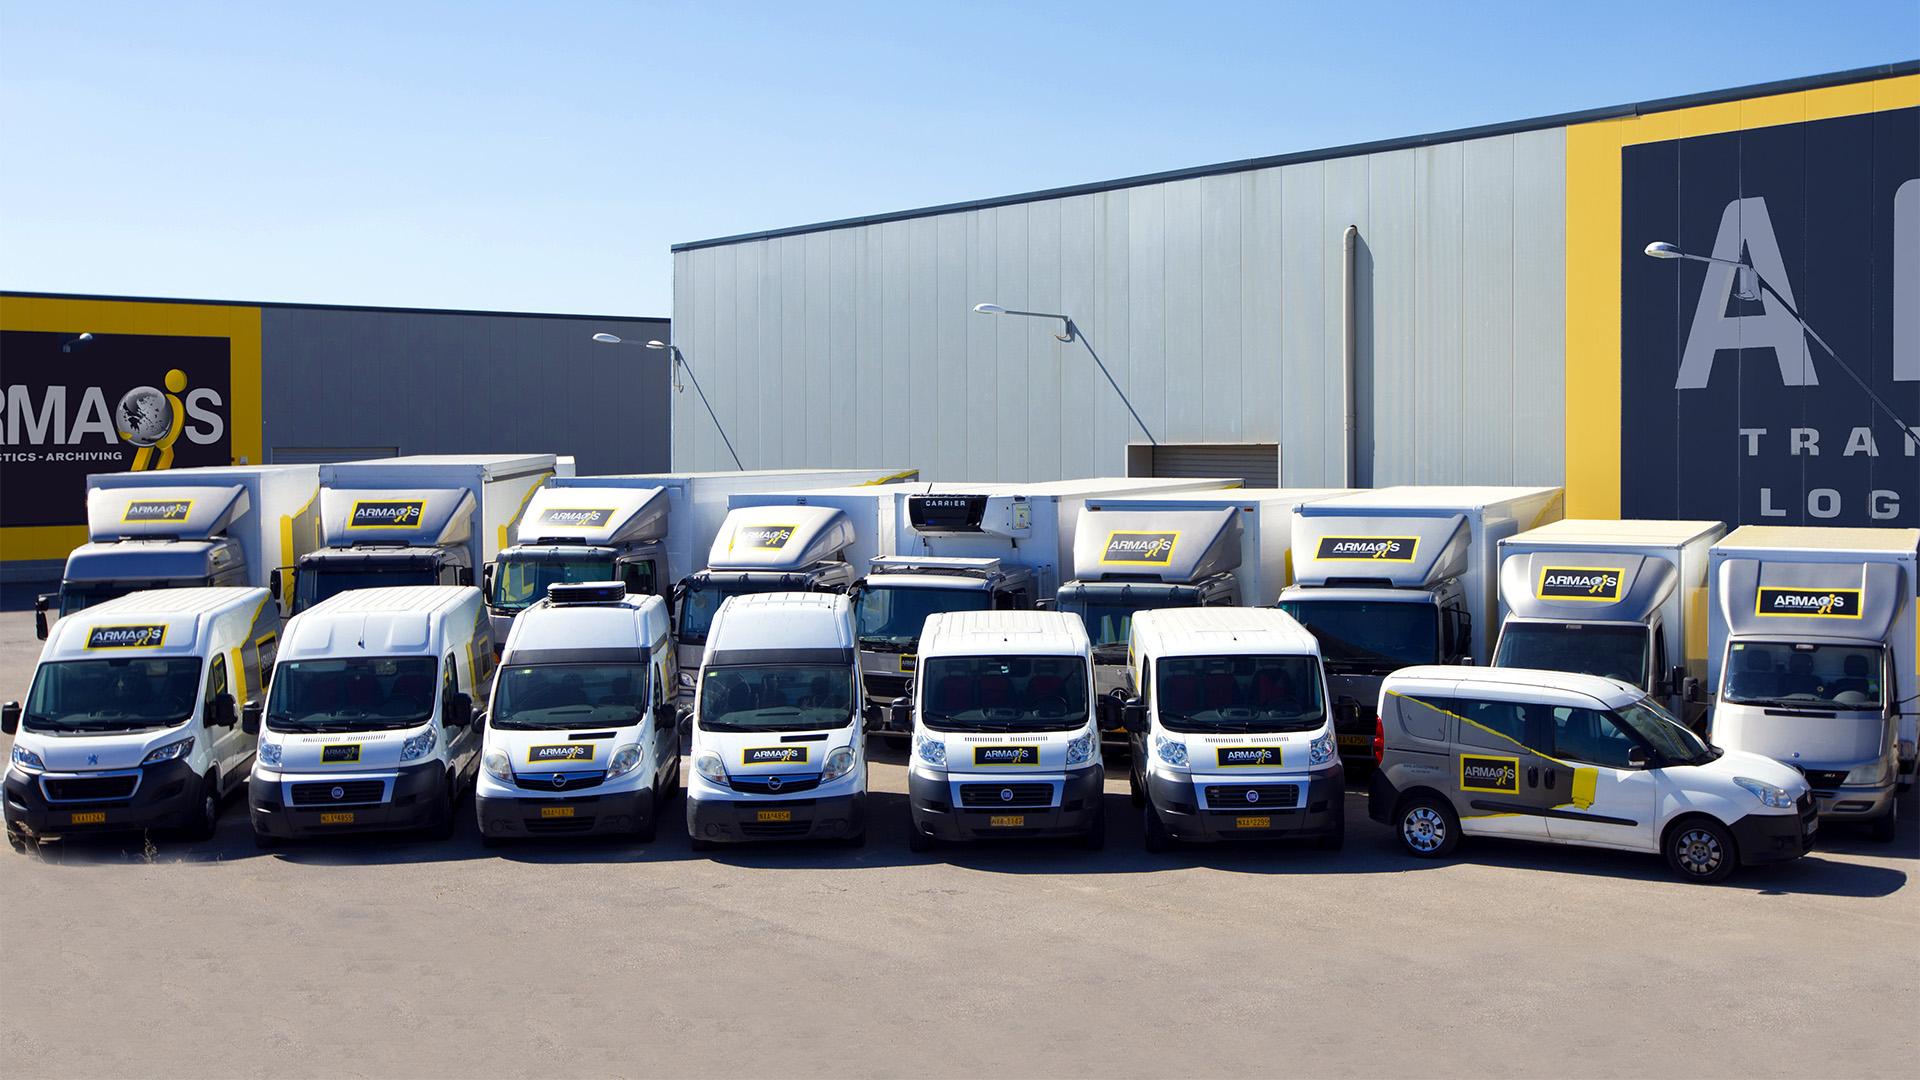 ARMAOS Transportation services